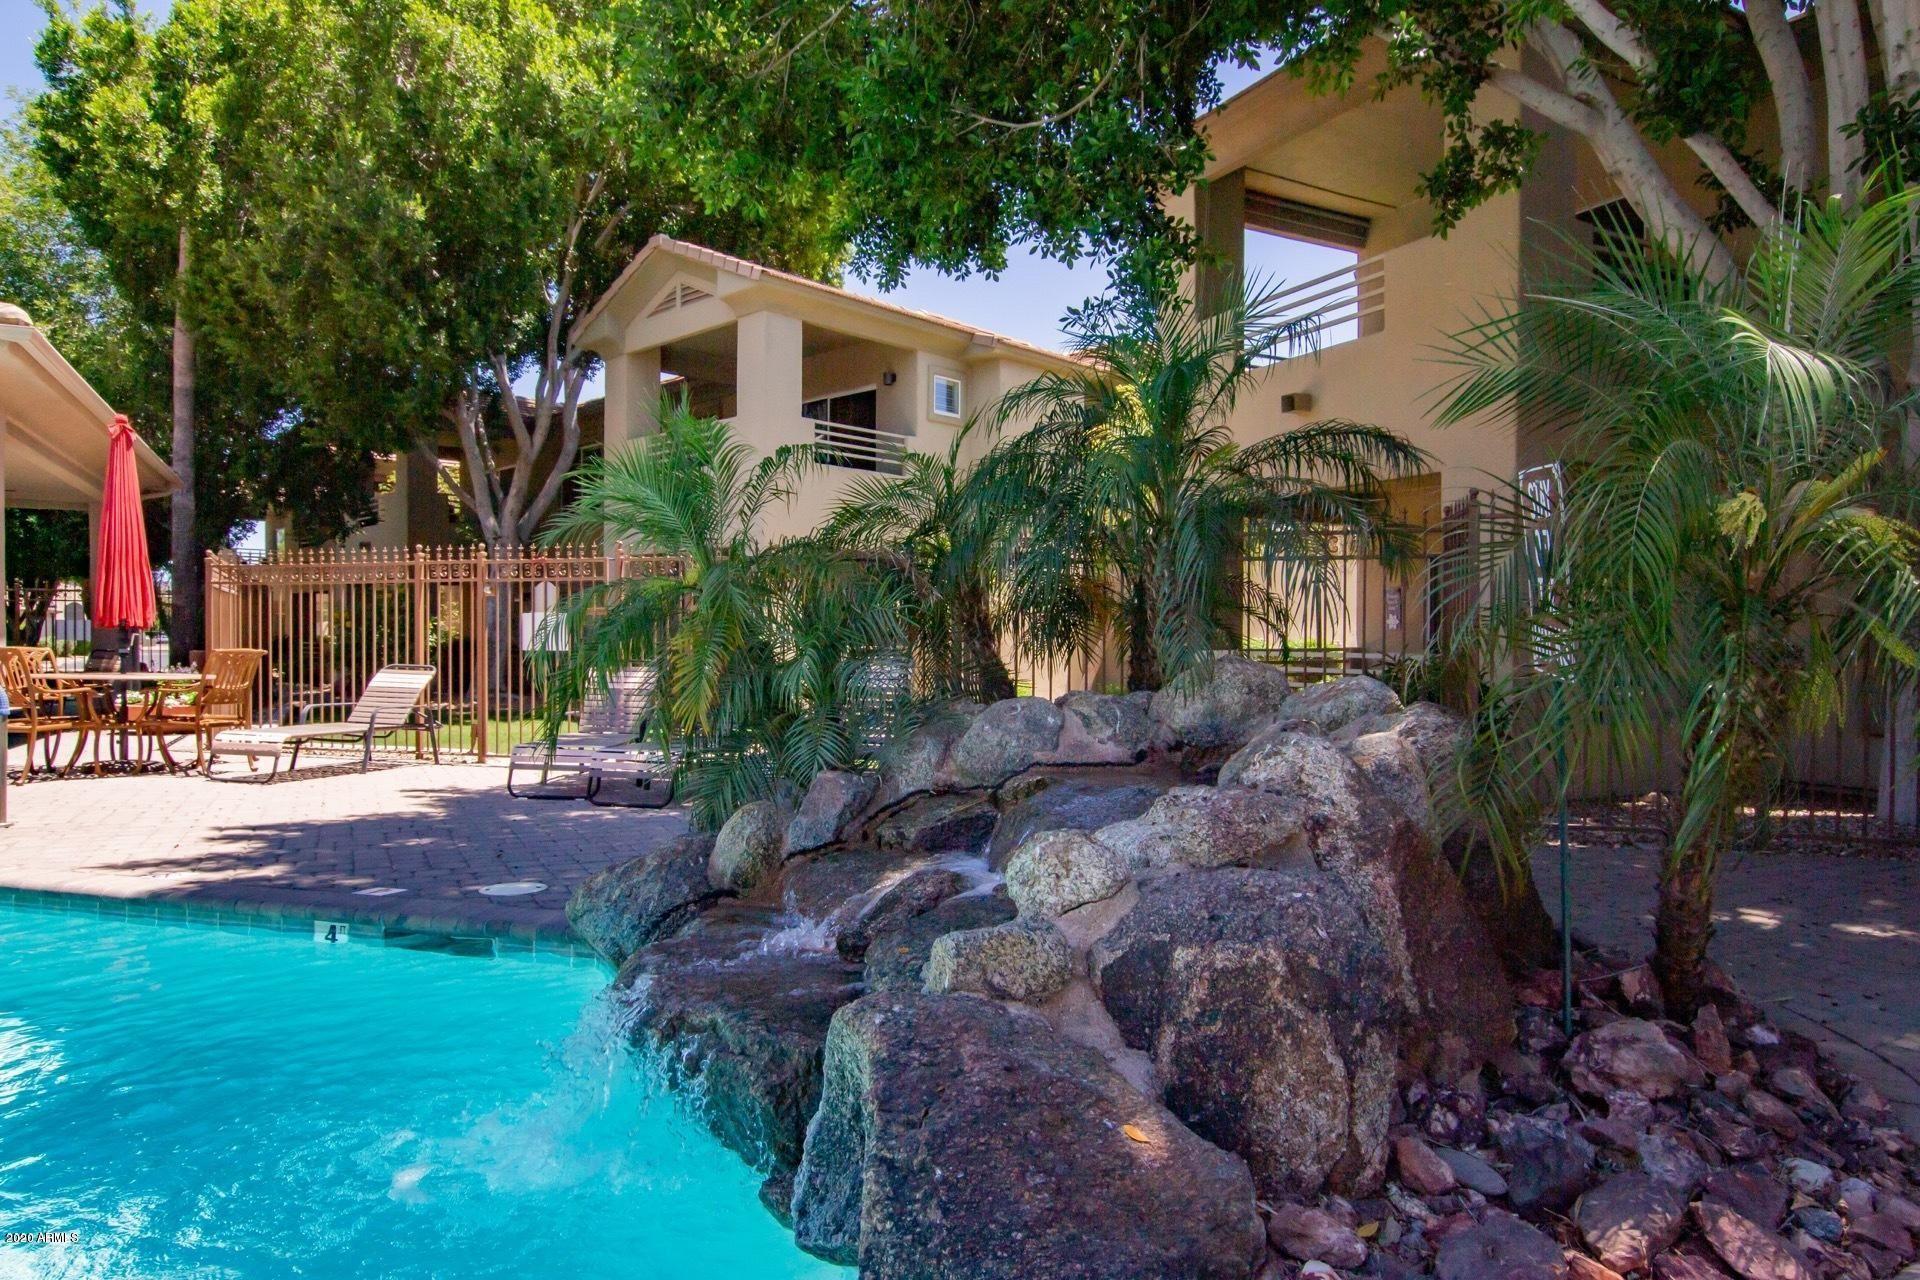 MLS 6155245 7401 W ARROWHEAD CLUBHOUSE Drive Unit 1065, Glendale, AZ 85308 Glendale AZ Condo or Townhome